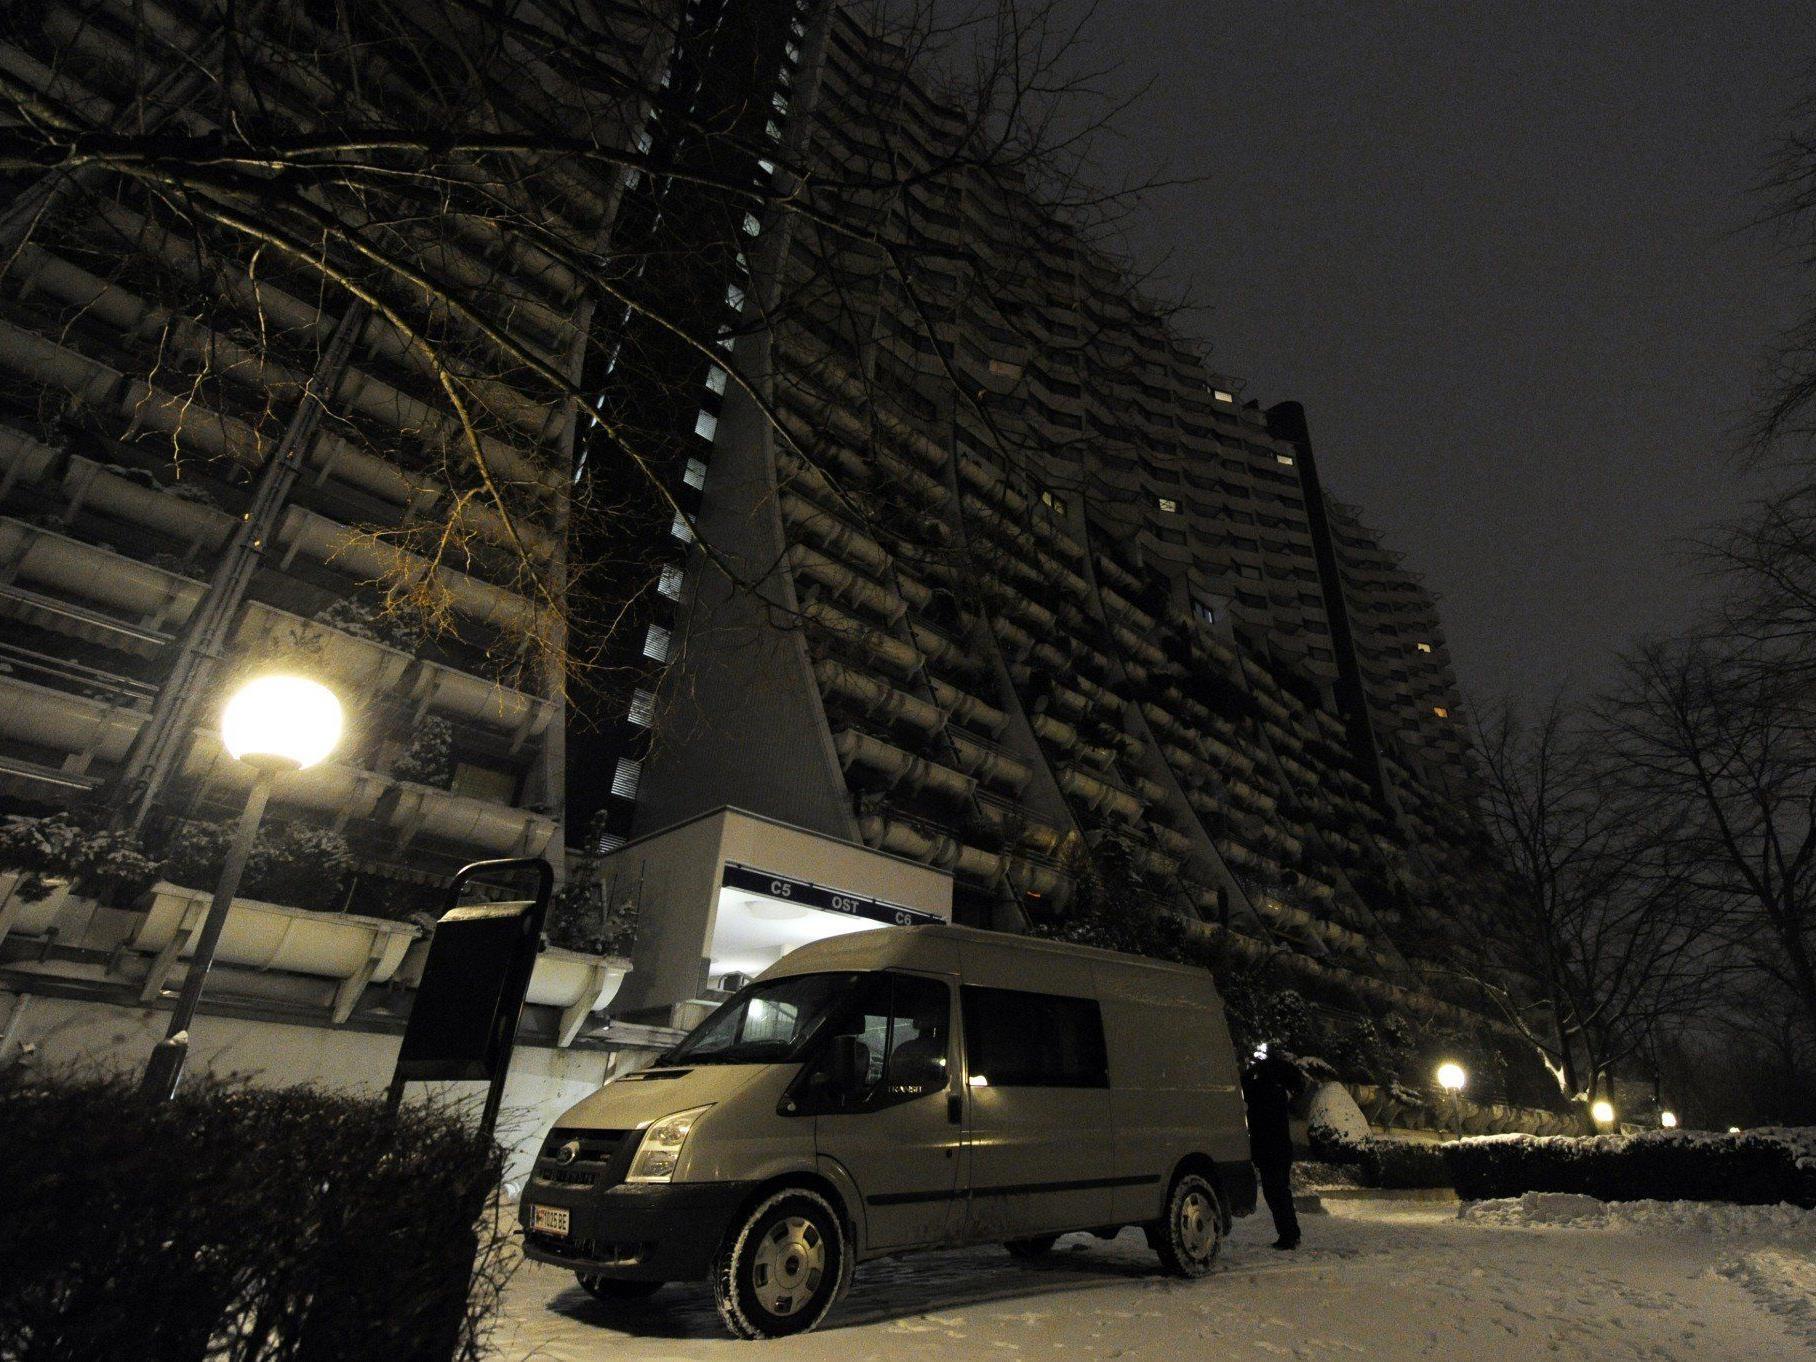 Mord und Selbstmord in Wien-Liesing - Pensionist vermutlich depressiv